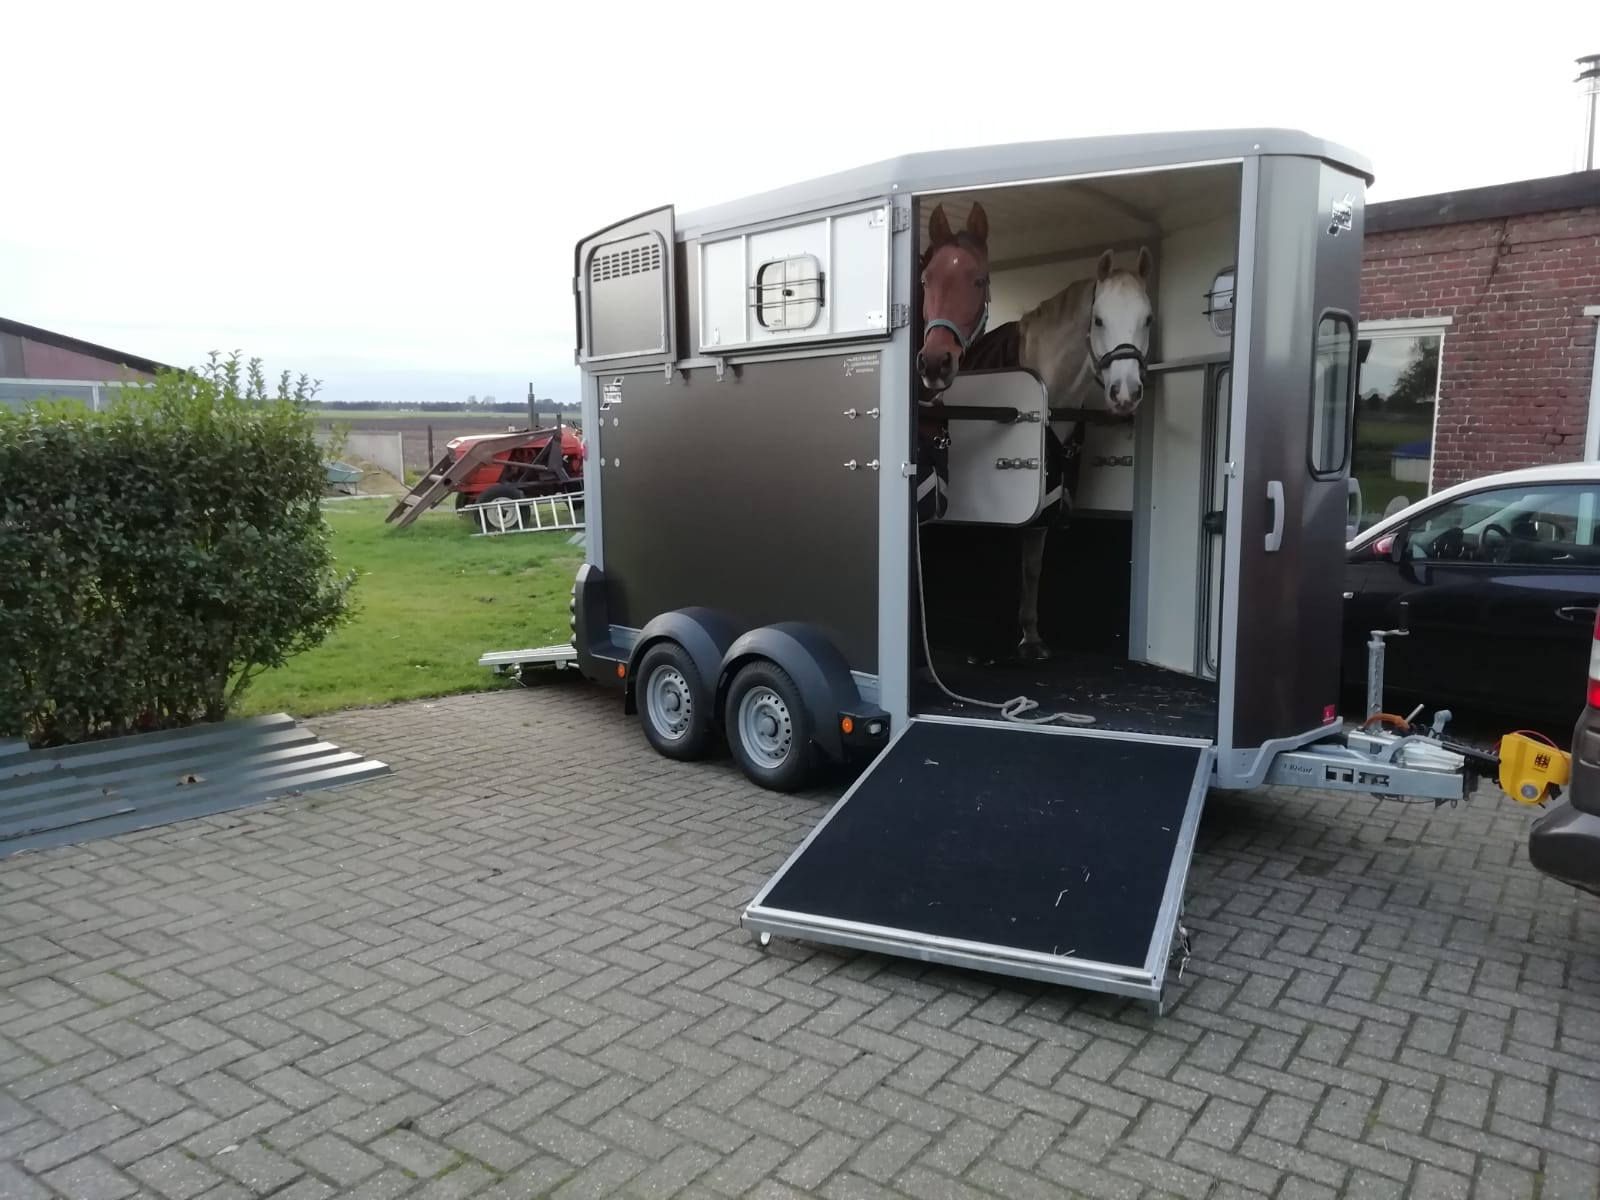 Ifor Williams HB511 2 paards paardentrailer